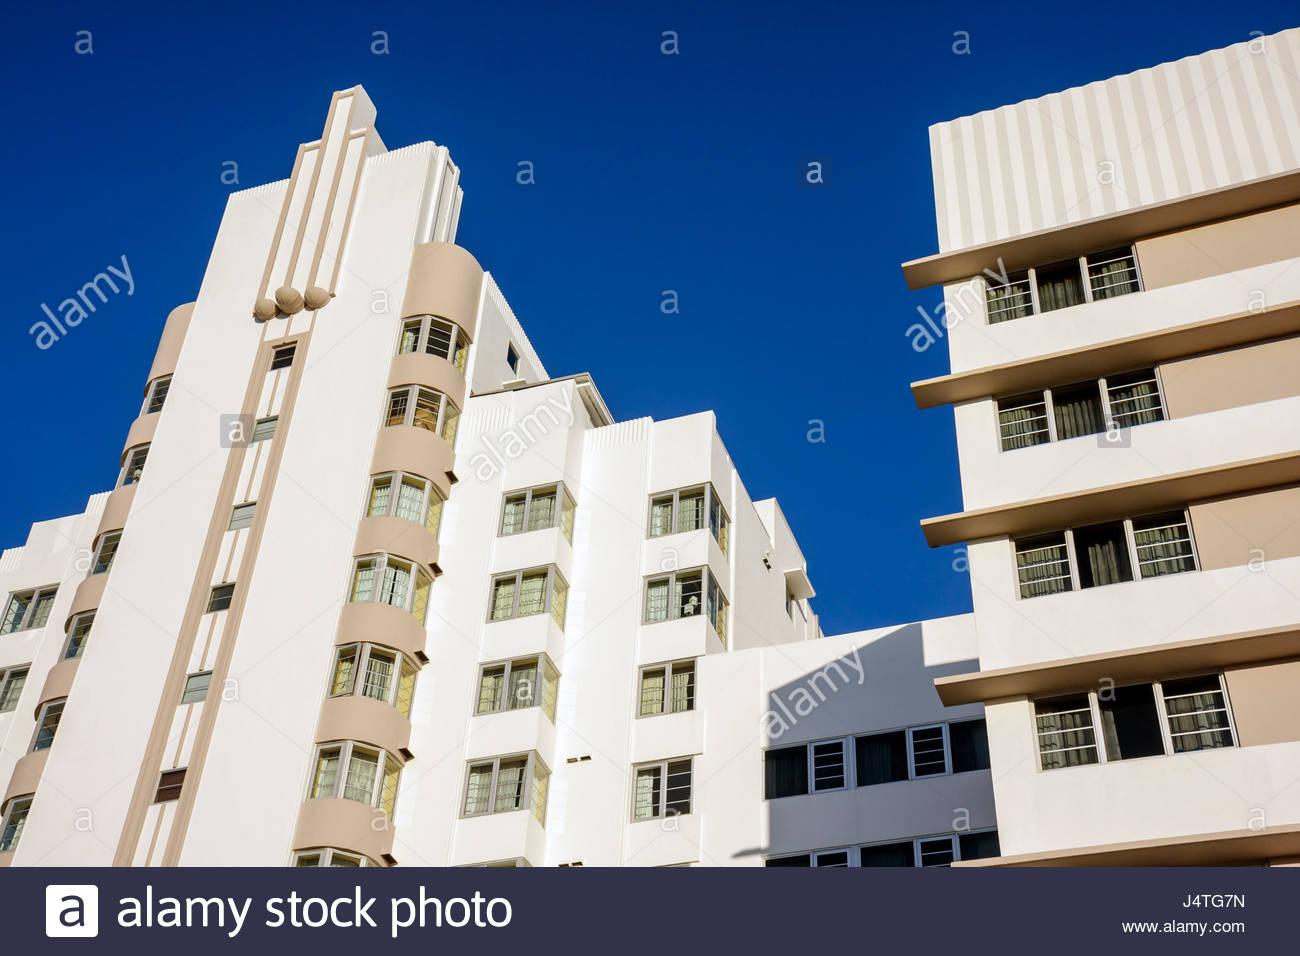 Deco Architektur miami florida collins avenue high rise gebäude deco